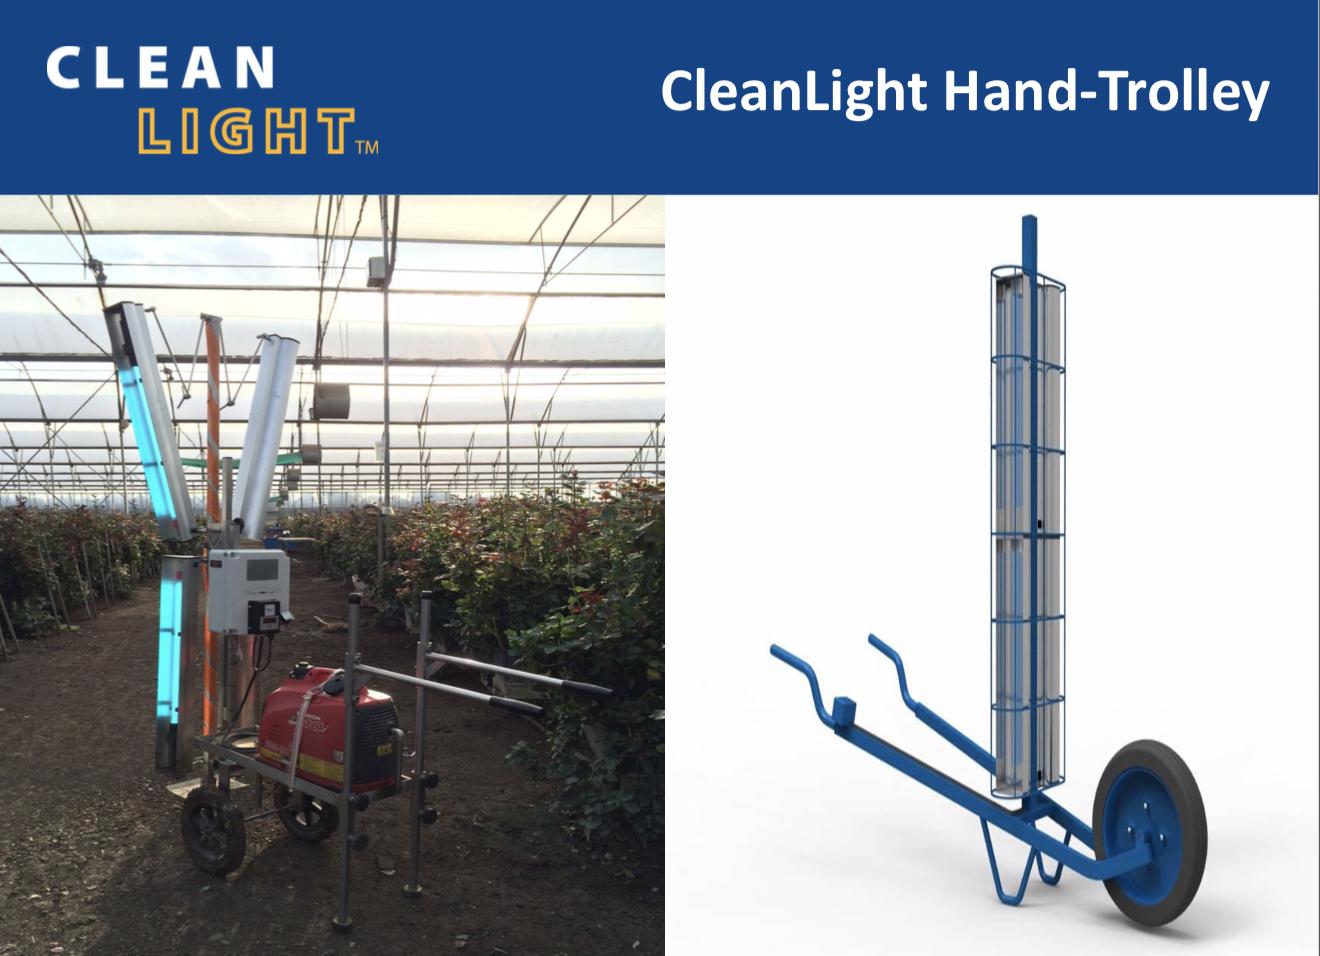 Productsheet Hand-Trolley